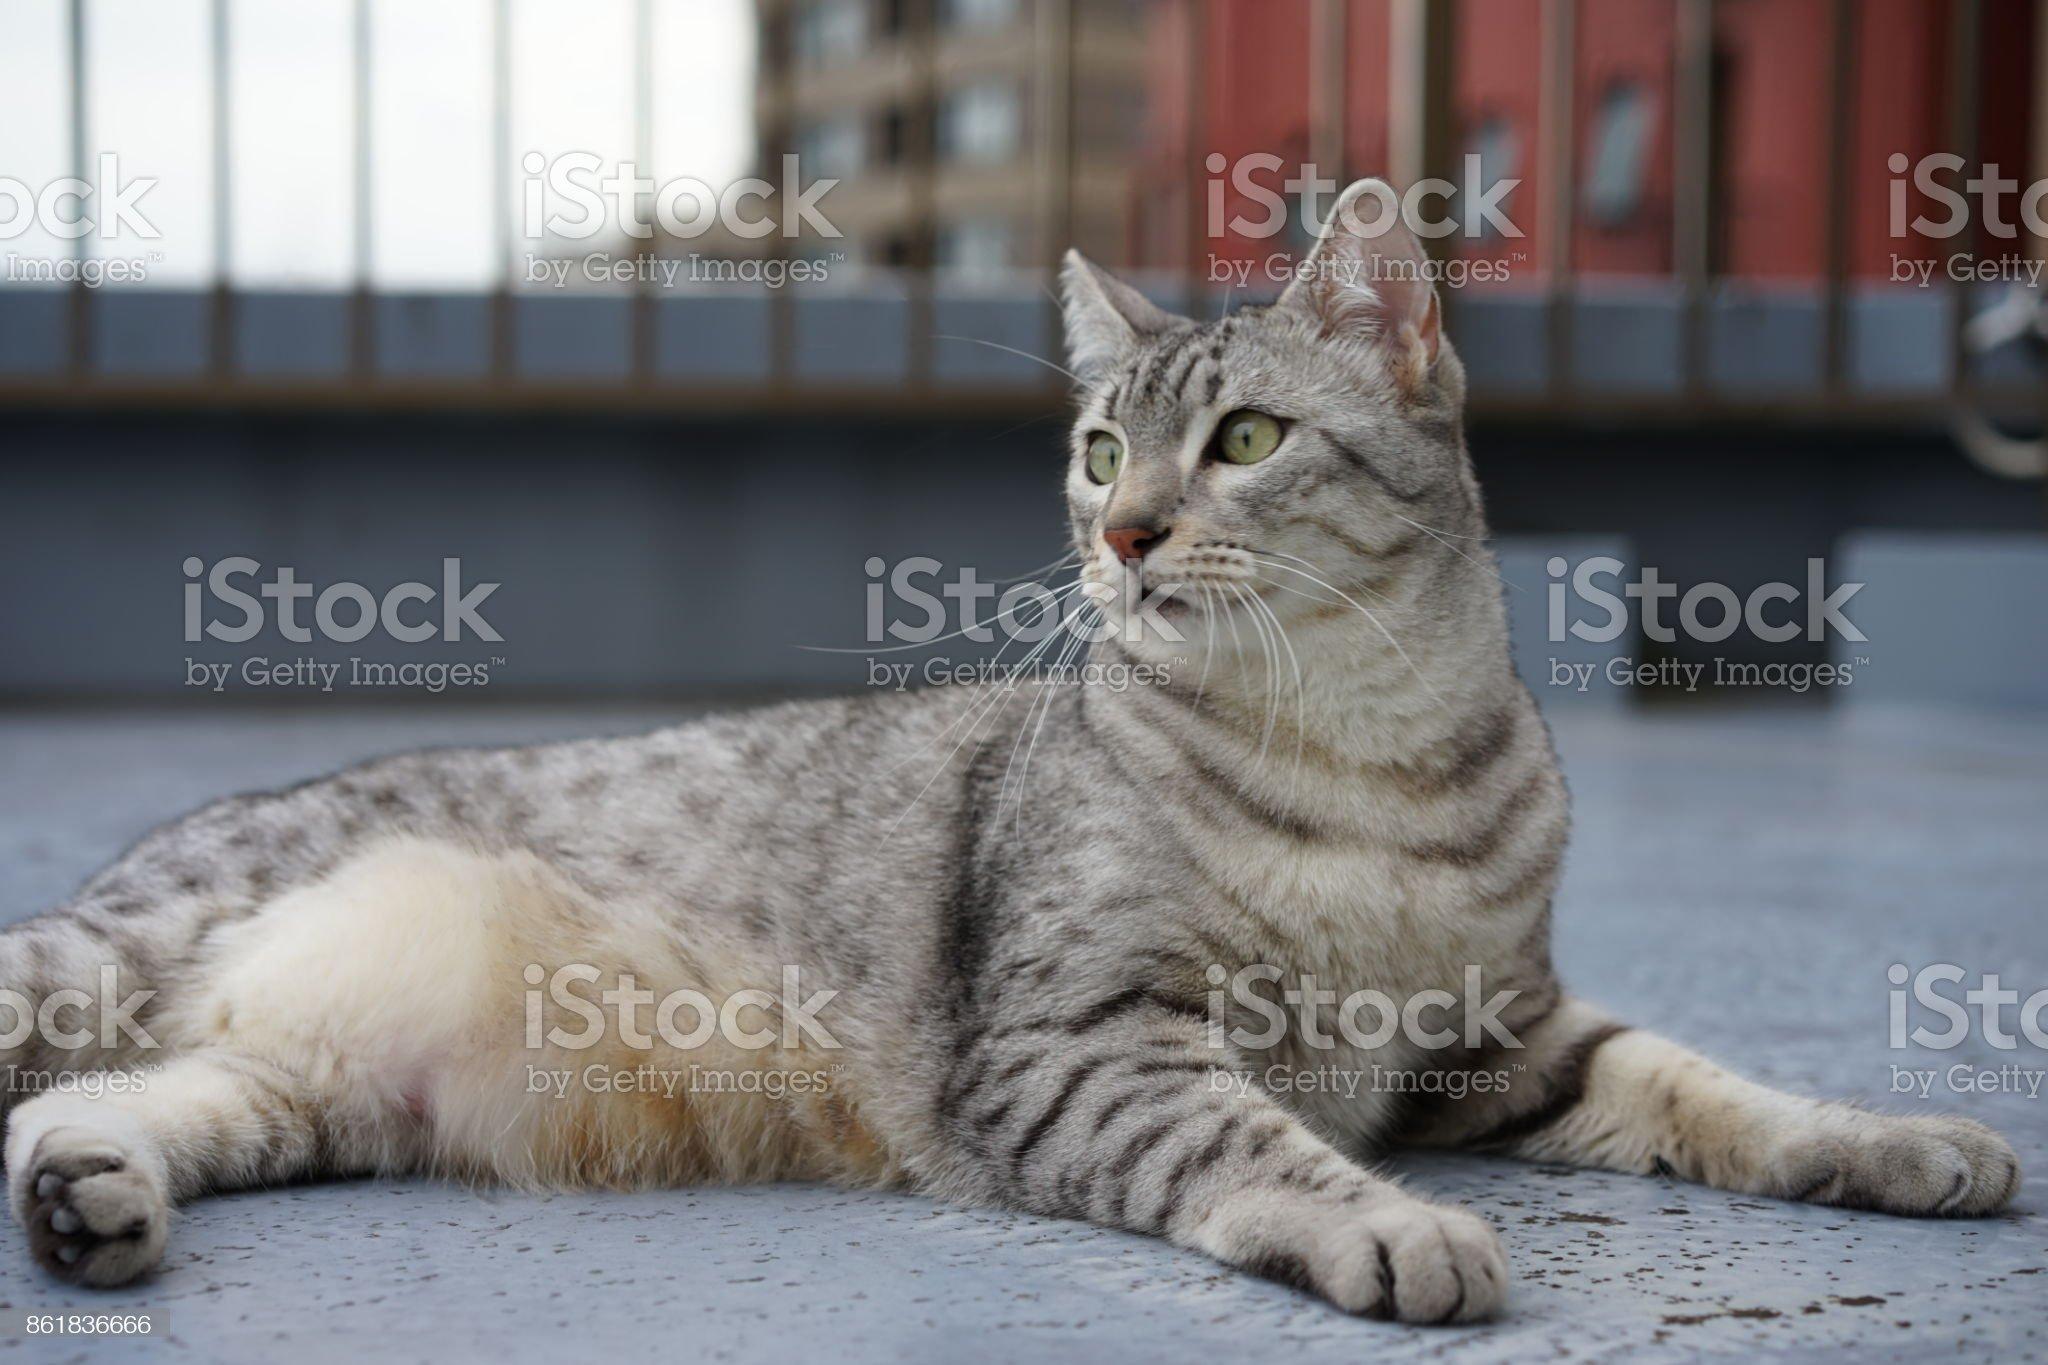 https://media.istockphoto.com/photos/egyptian-mau-picture-id861836666?s=2048x2048